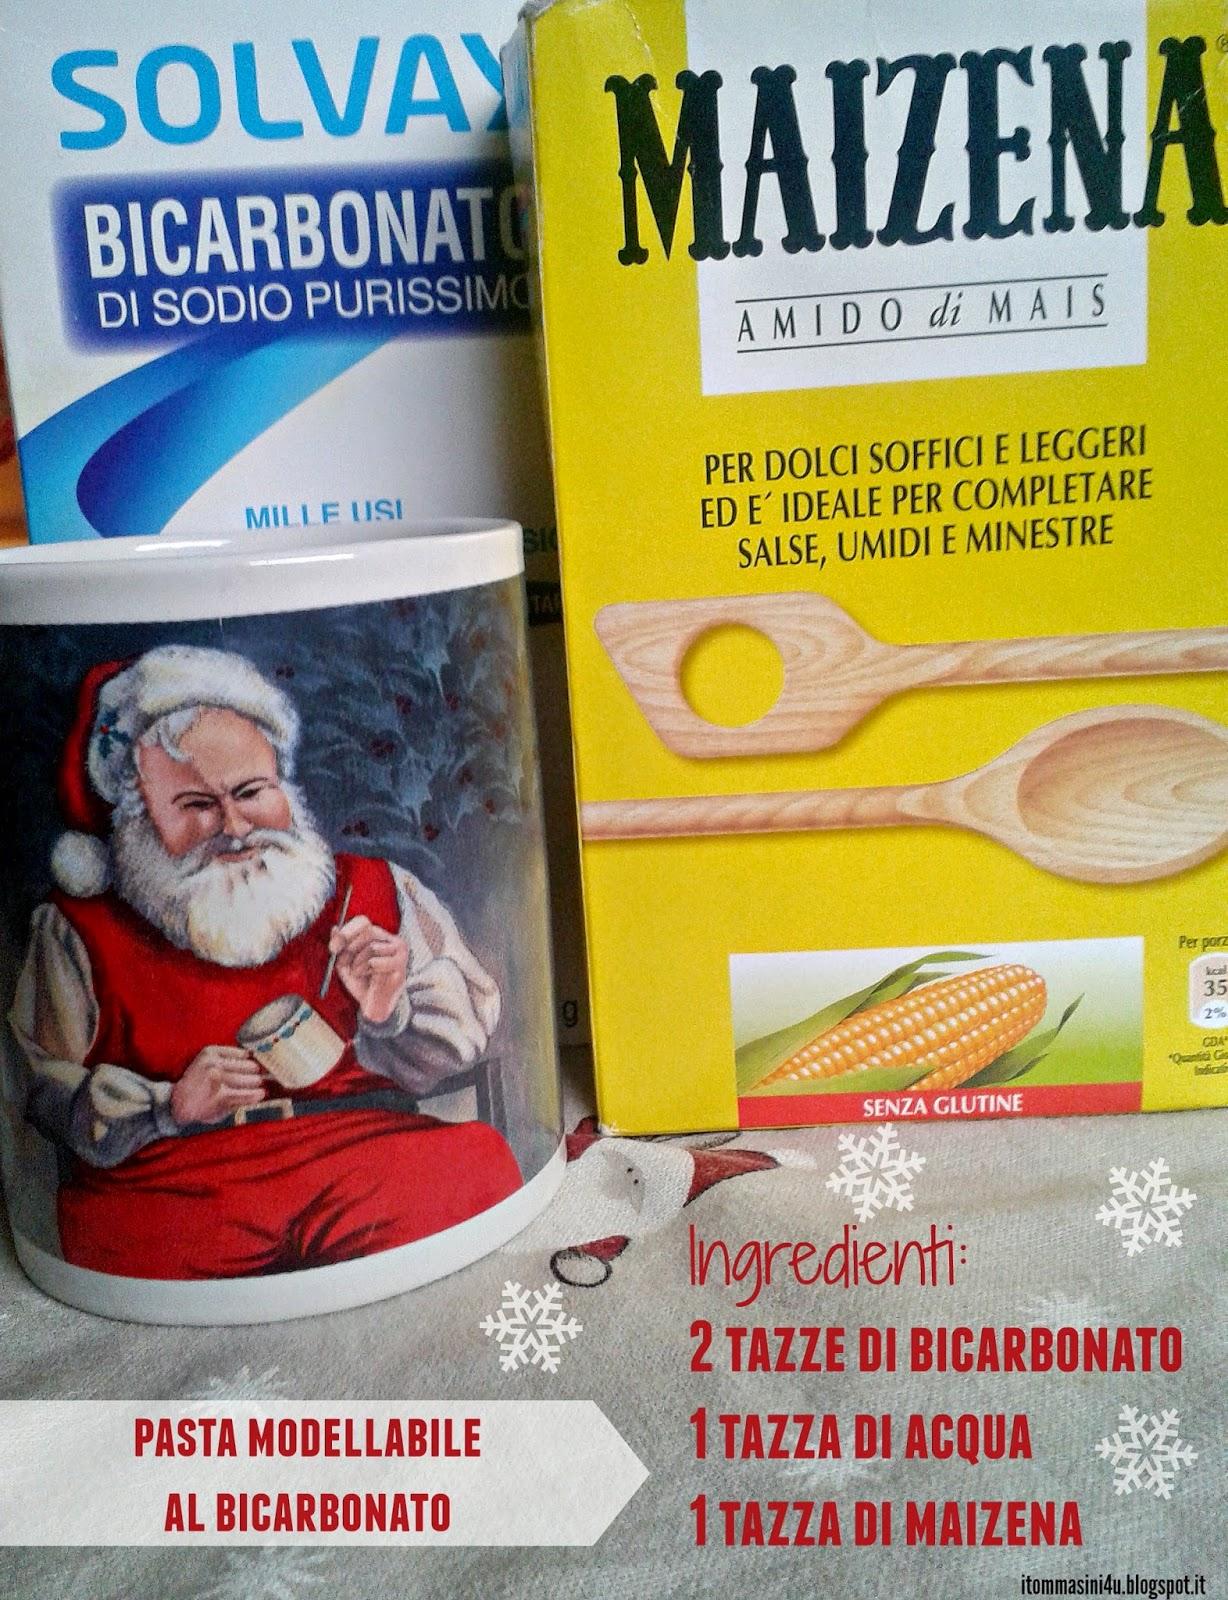 Bien connu Pasta modellabile al bicarbonato QH92